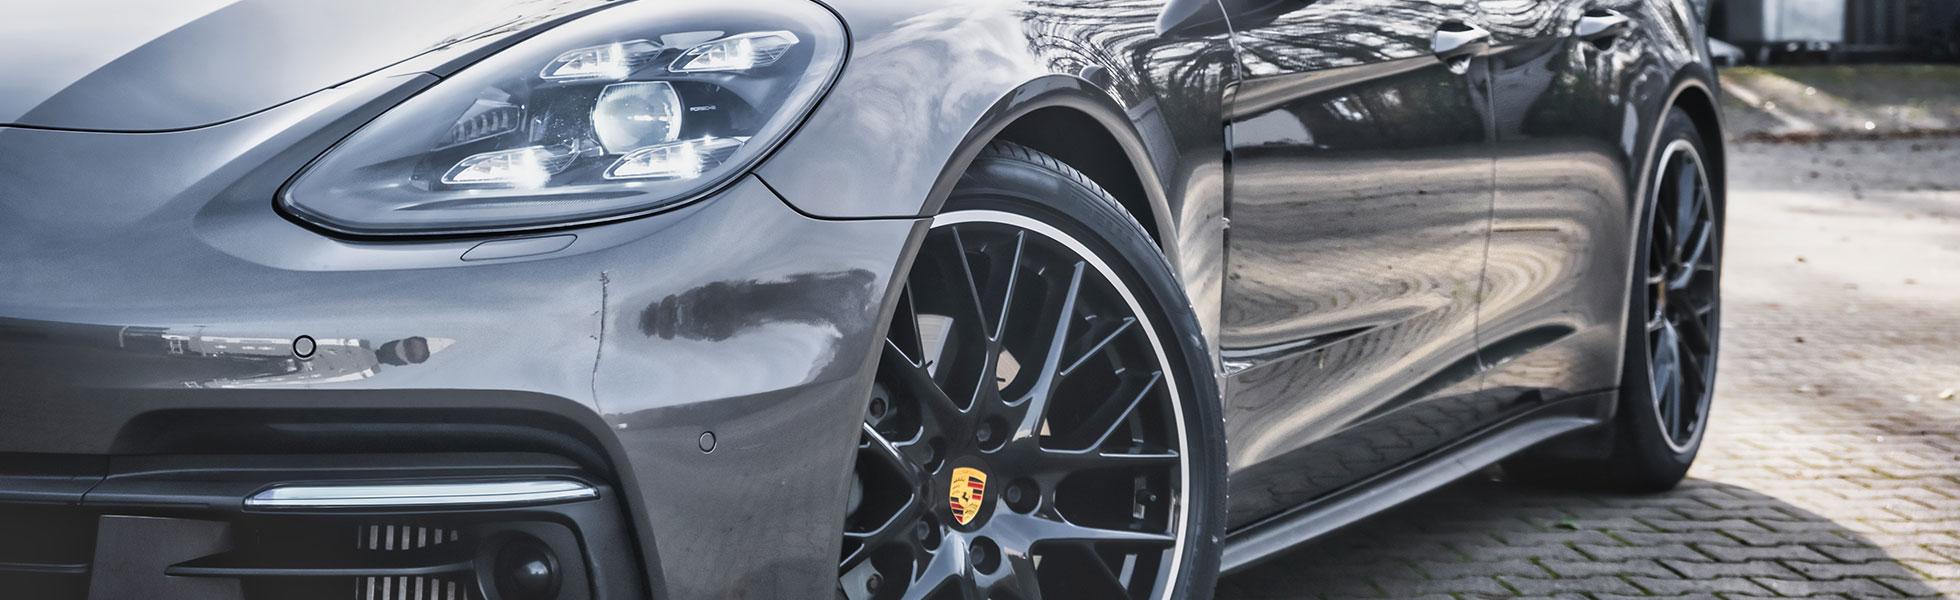 Porsche Panamery Buy Rims & Complete Wheels